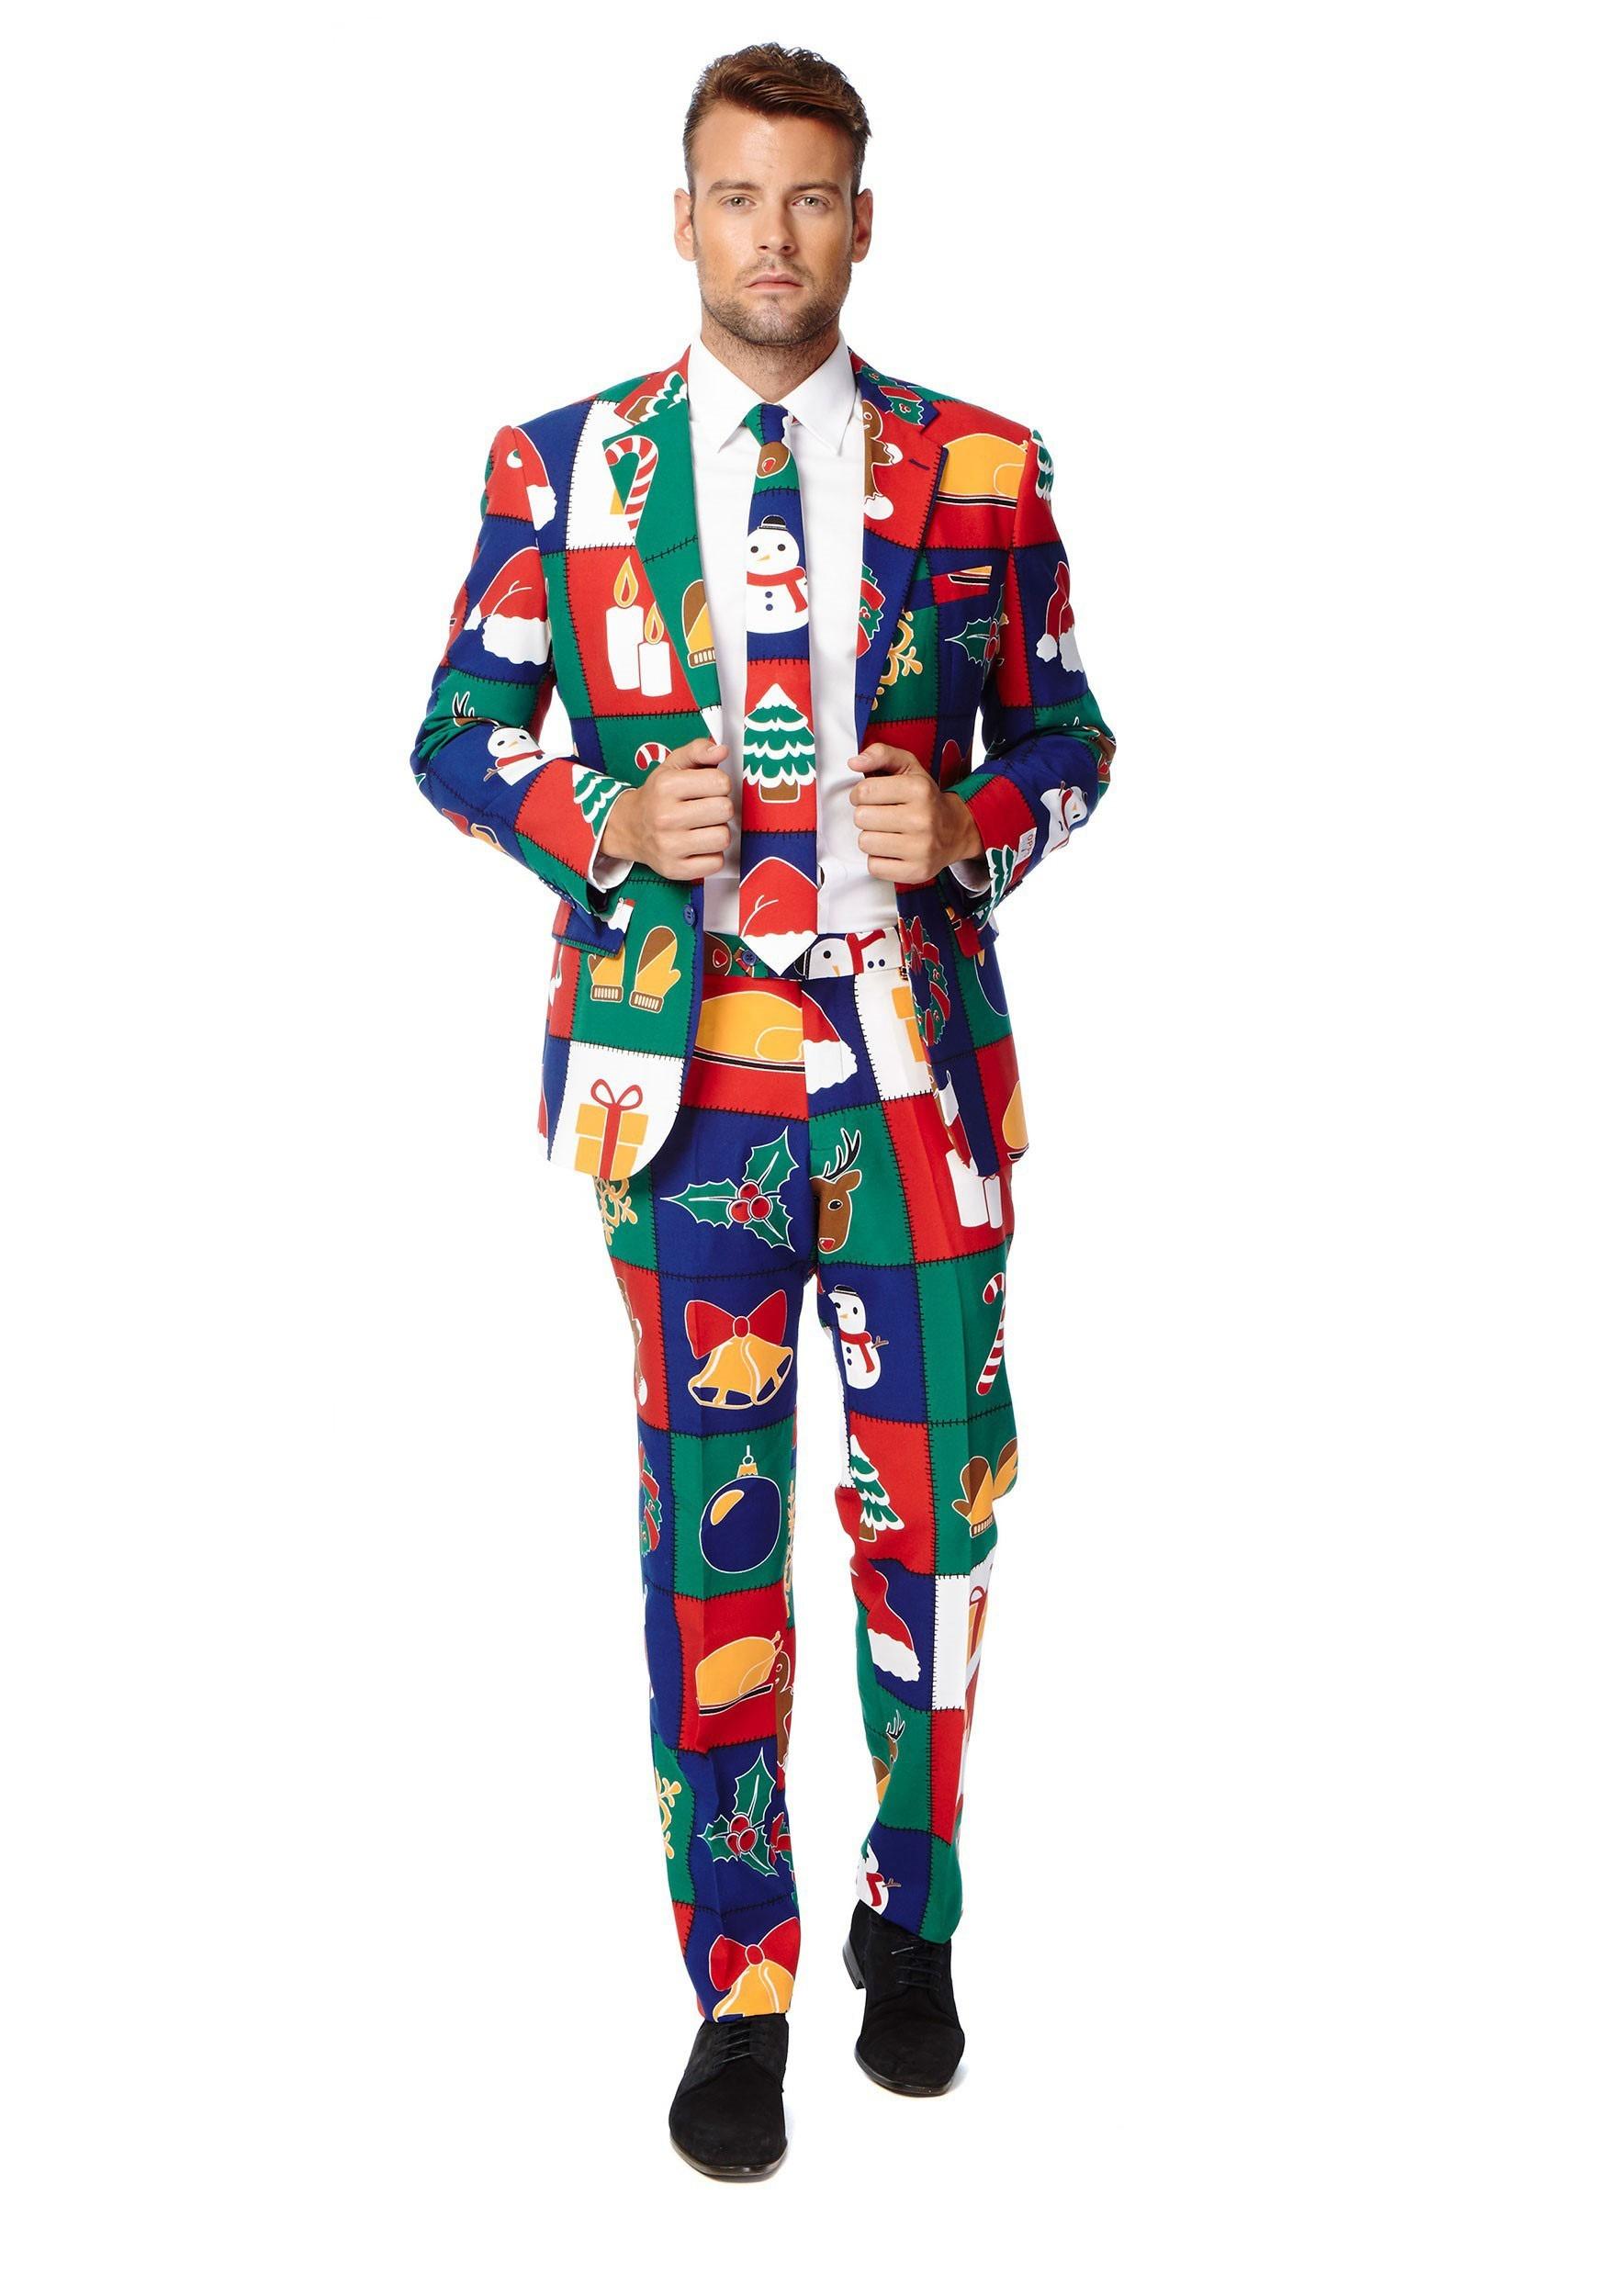 Quilty Pleasure Holiday Opposuit Costume